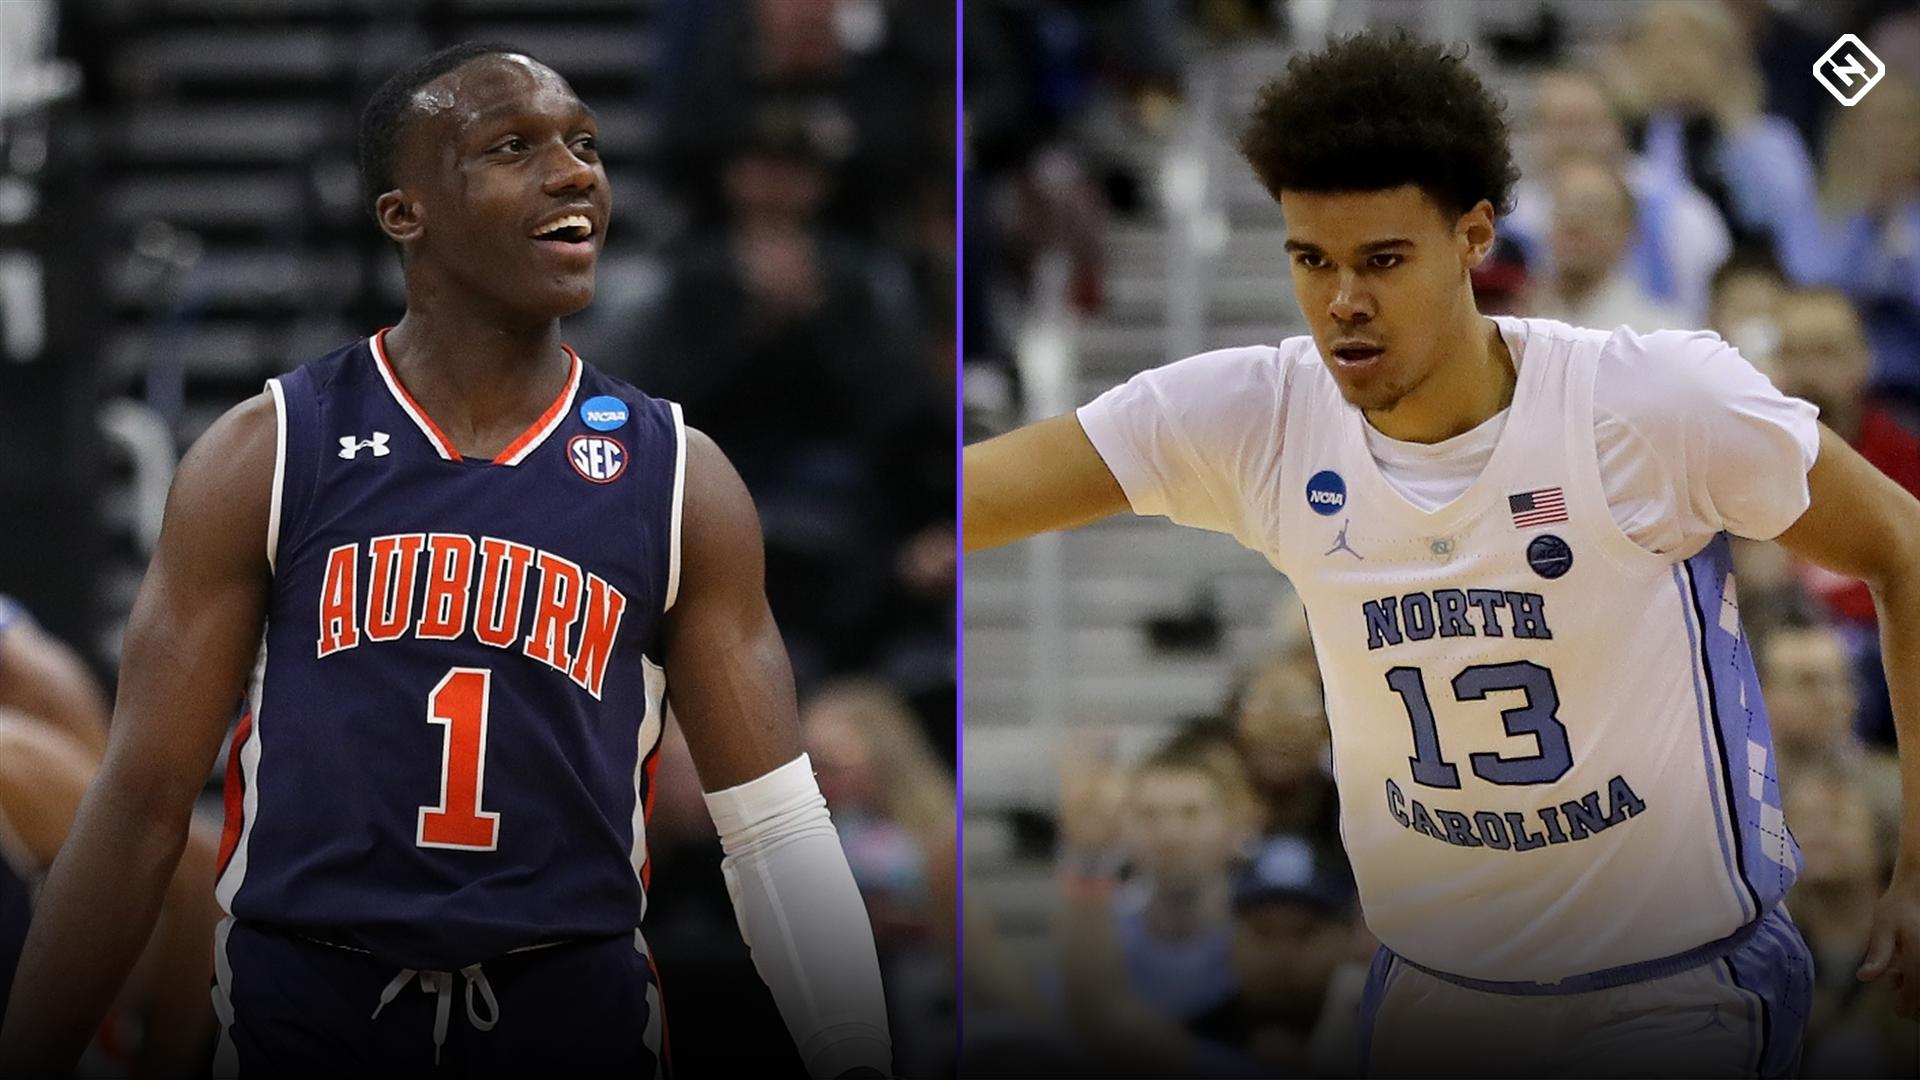 UNC vs  Auburn: Picks, predictions for March Madness Sweet 16